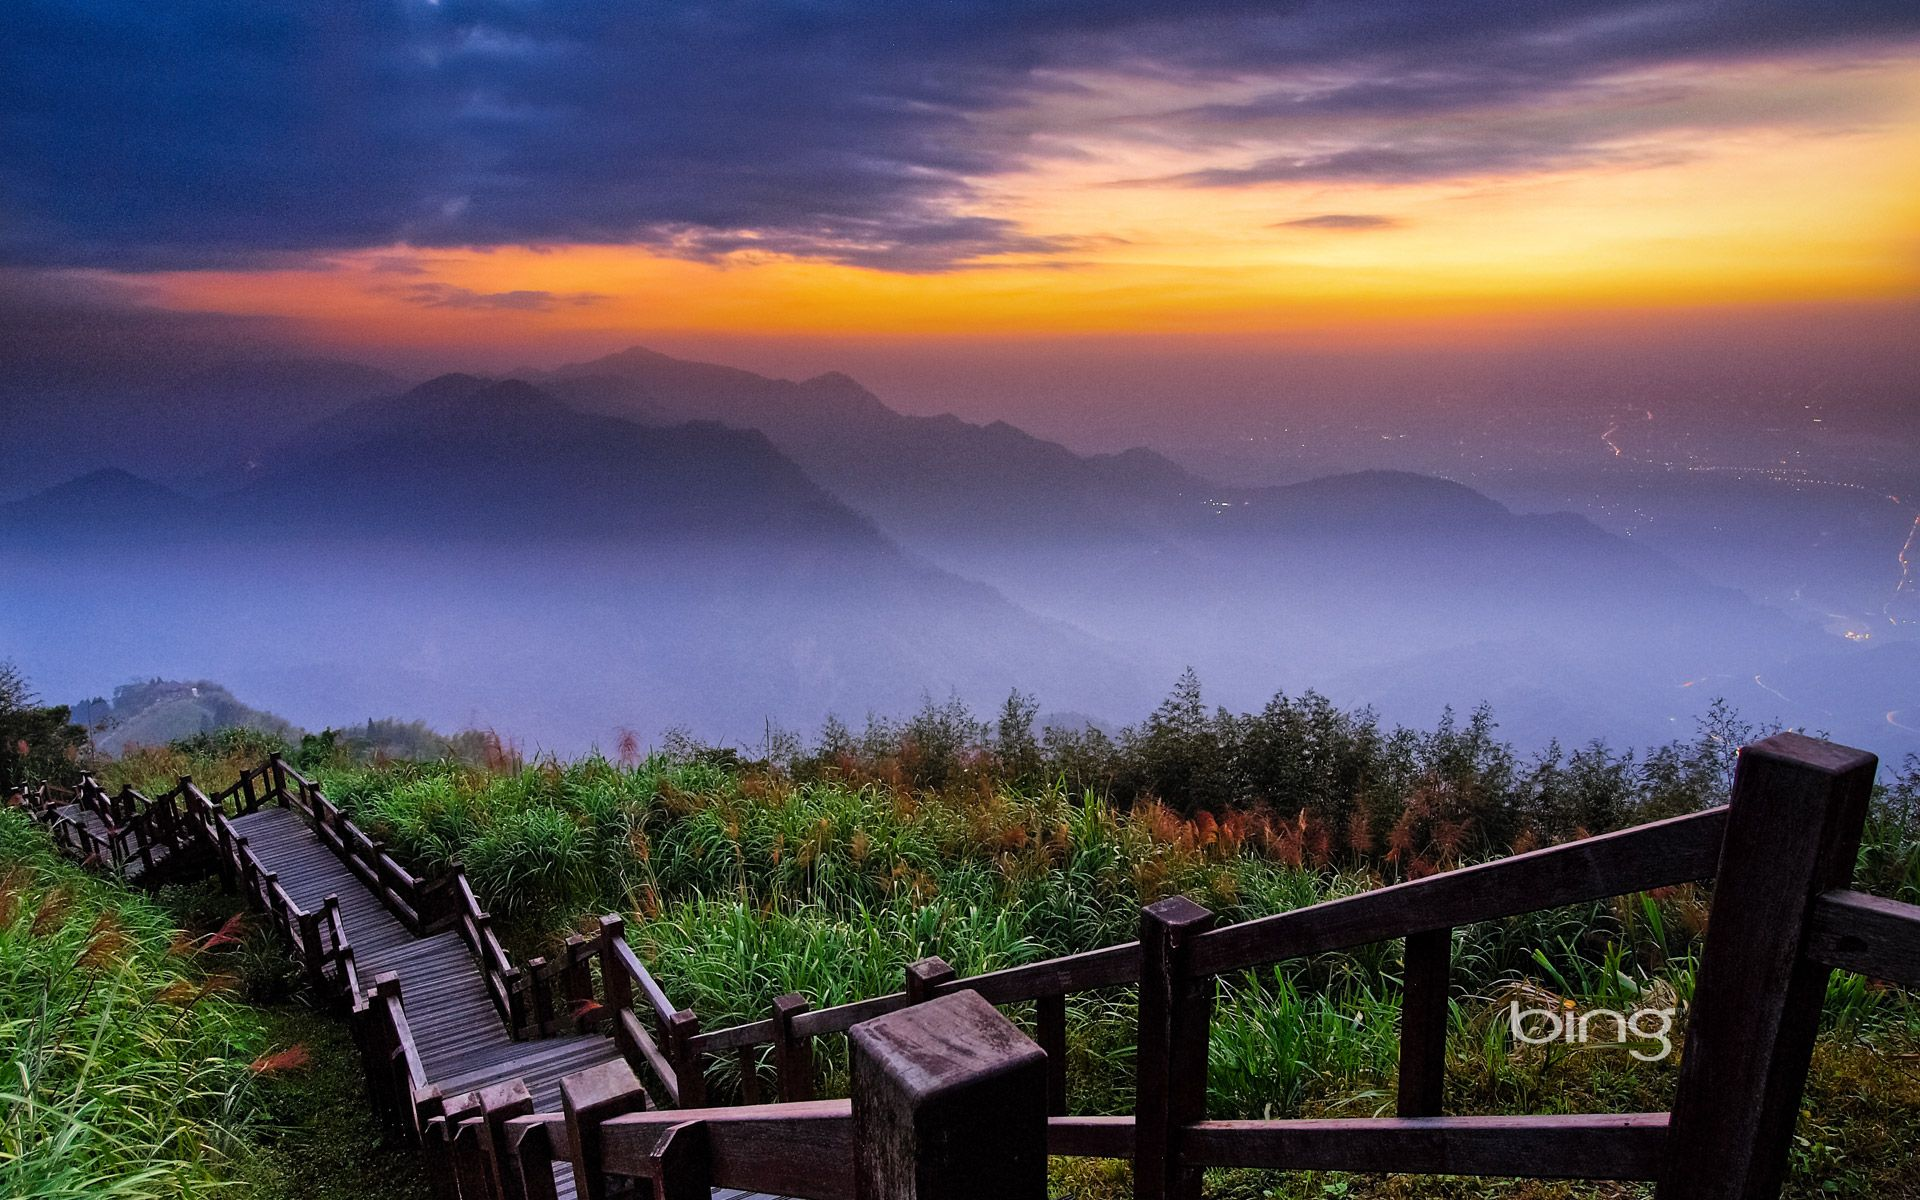 Alishan National Scenic Area Taiwan Yahoo Image Search Results Scenic Chiayi County Beautiful Sites